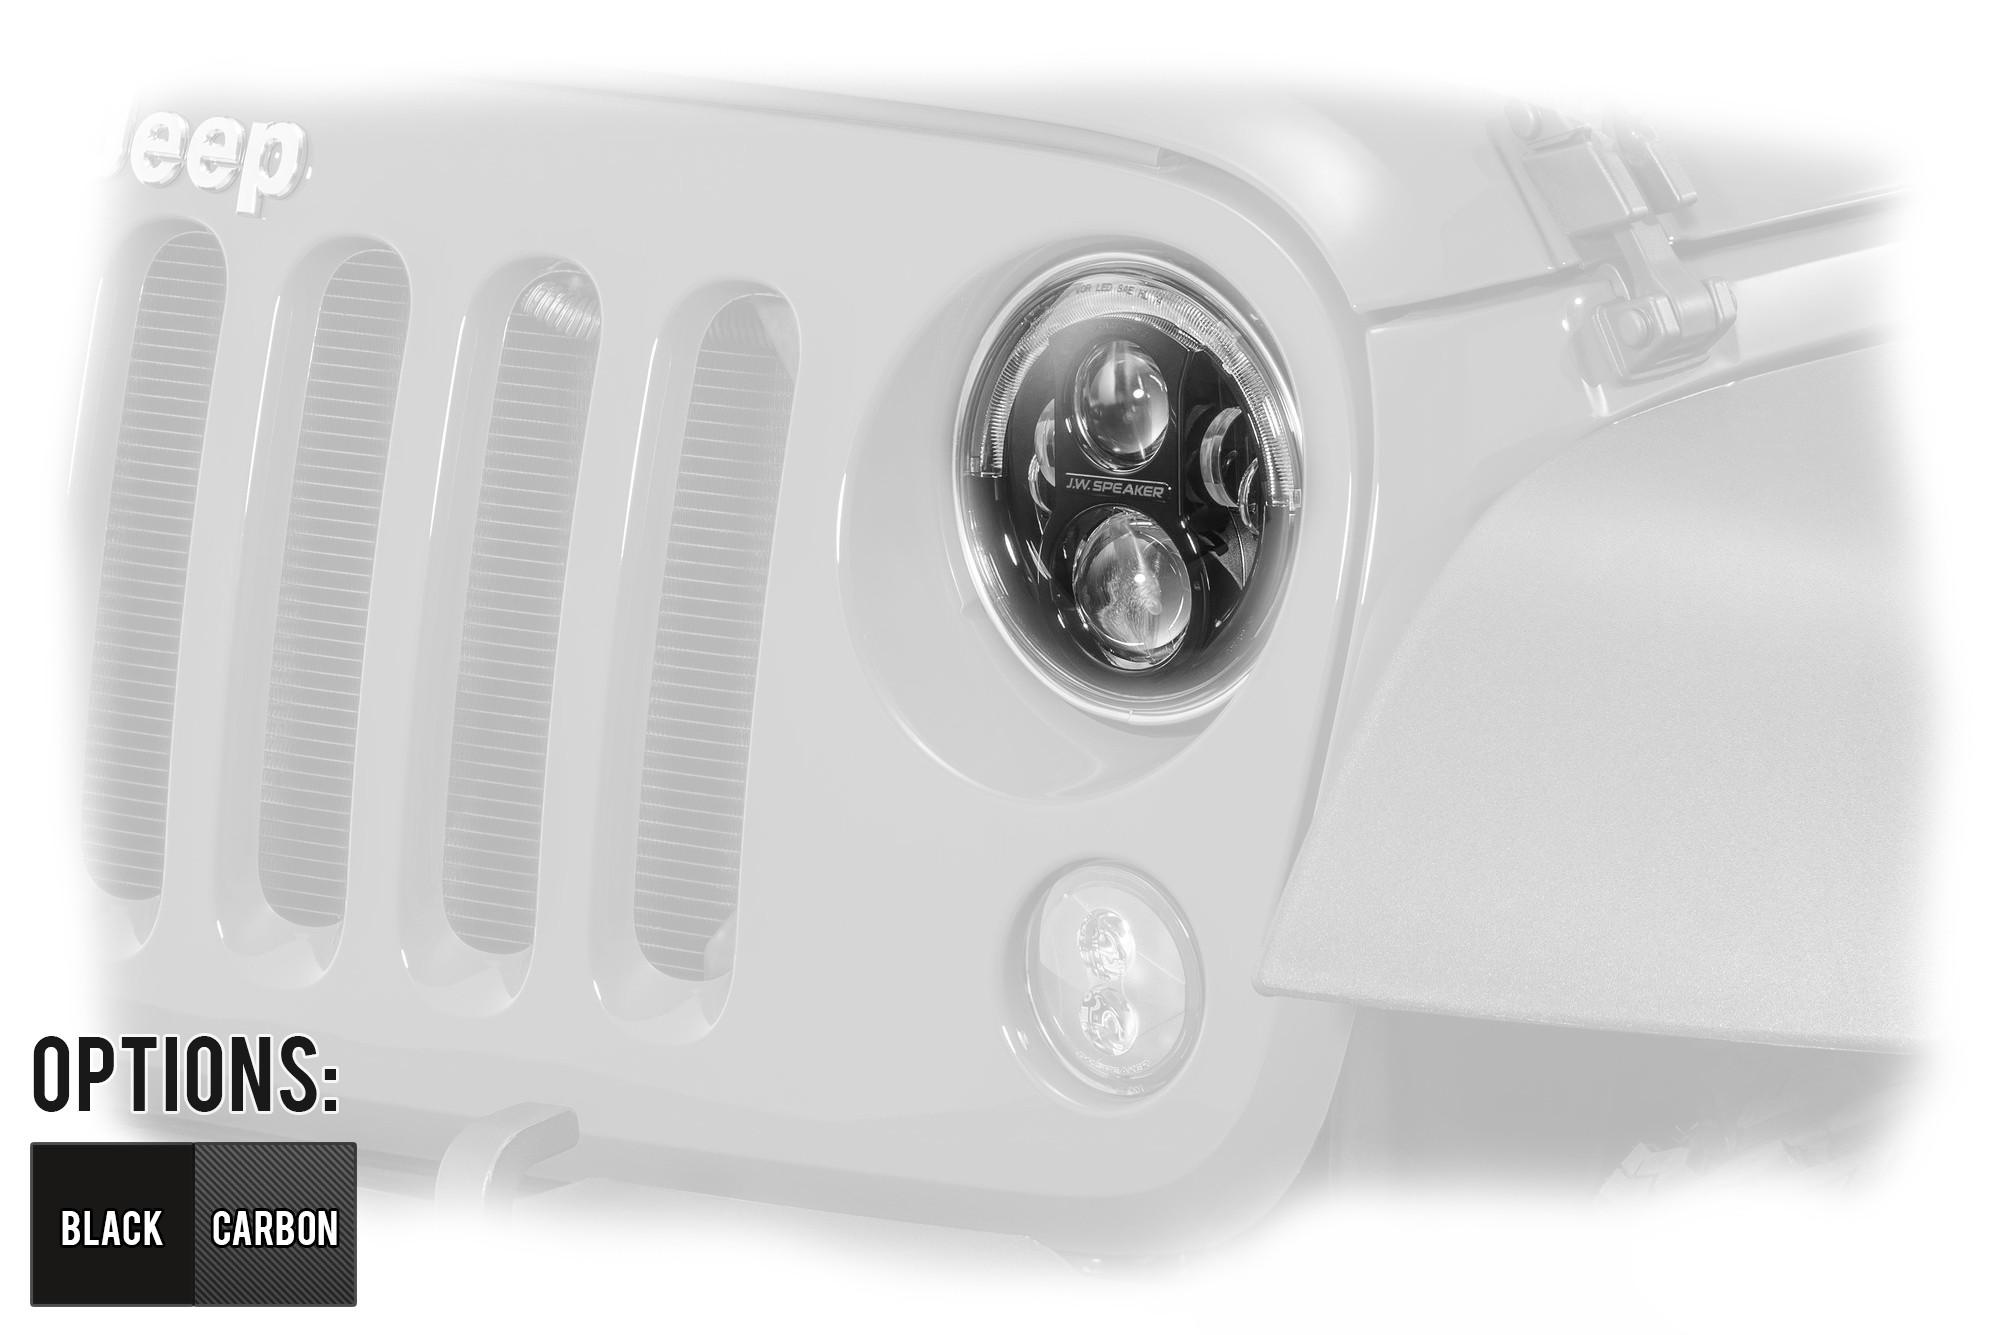 "J.W. Speaker Model 8700 Evolution J2 Series 7"" LED Headlight (Pair) For 2007-18 Jeep Wrangler JK 2 Door & Unlimited 4 Door Models"